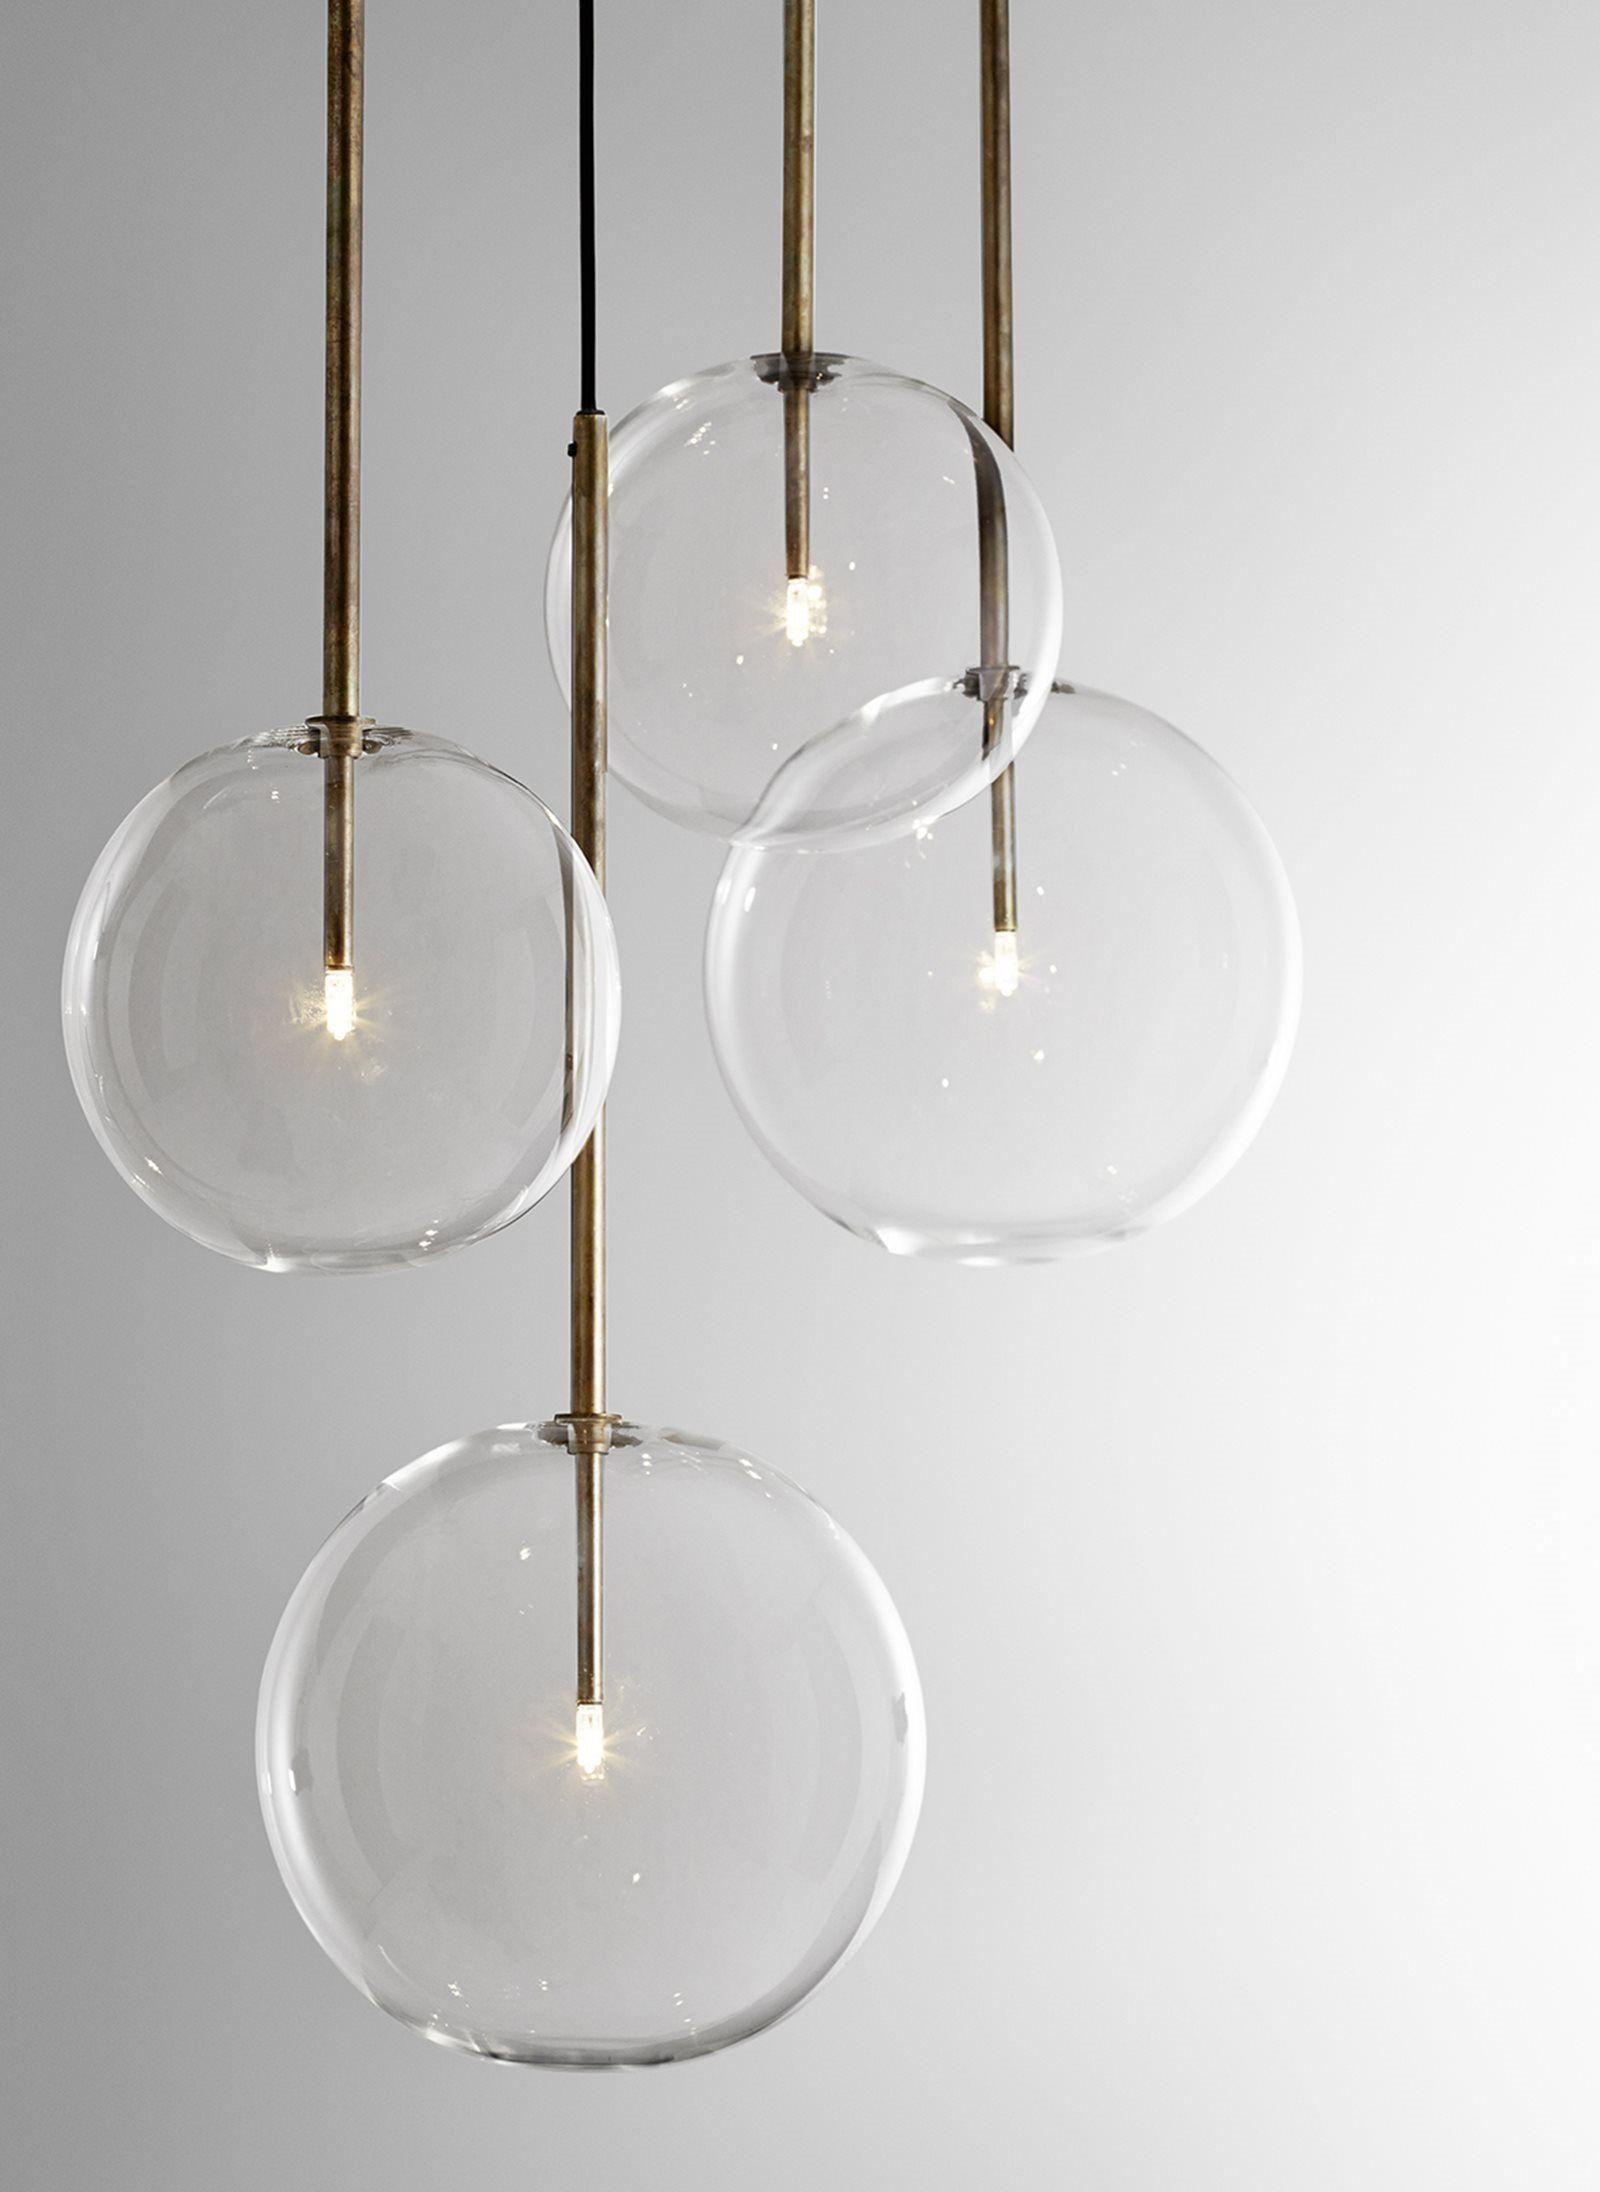 Epingle Sur Lighting